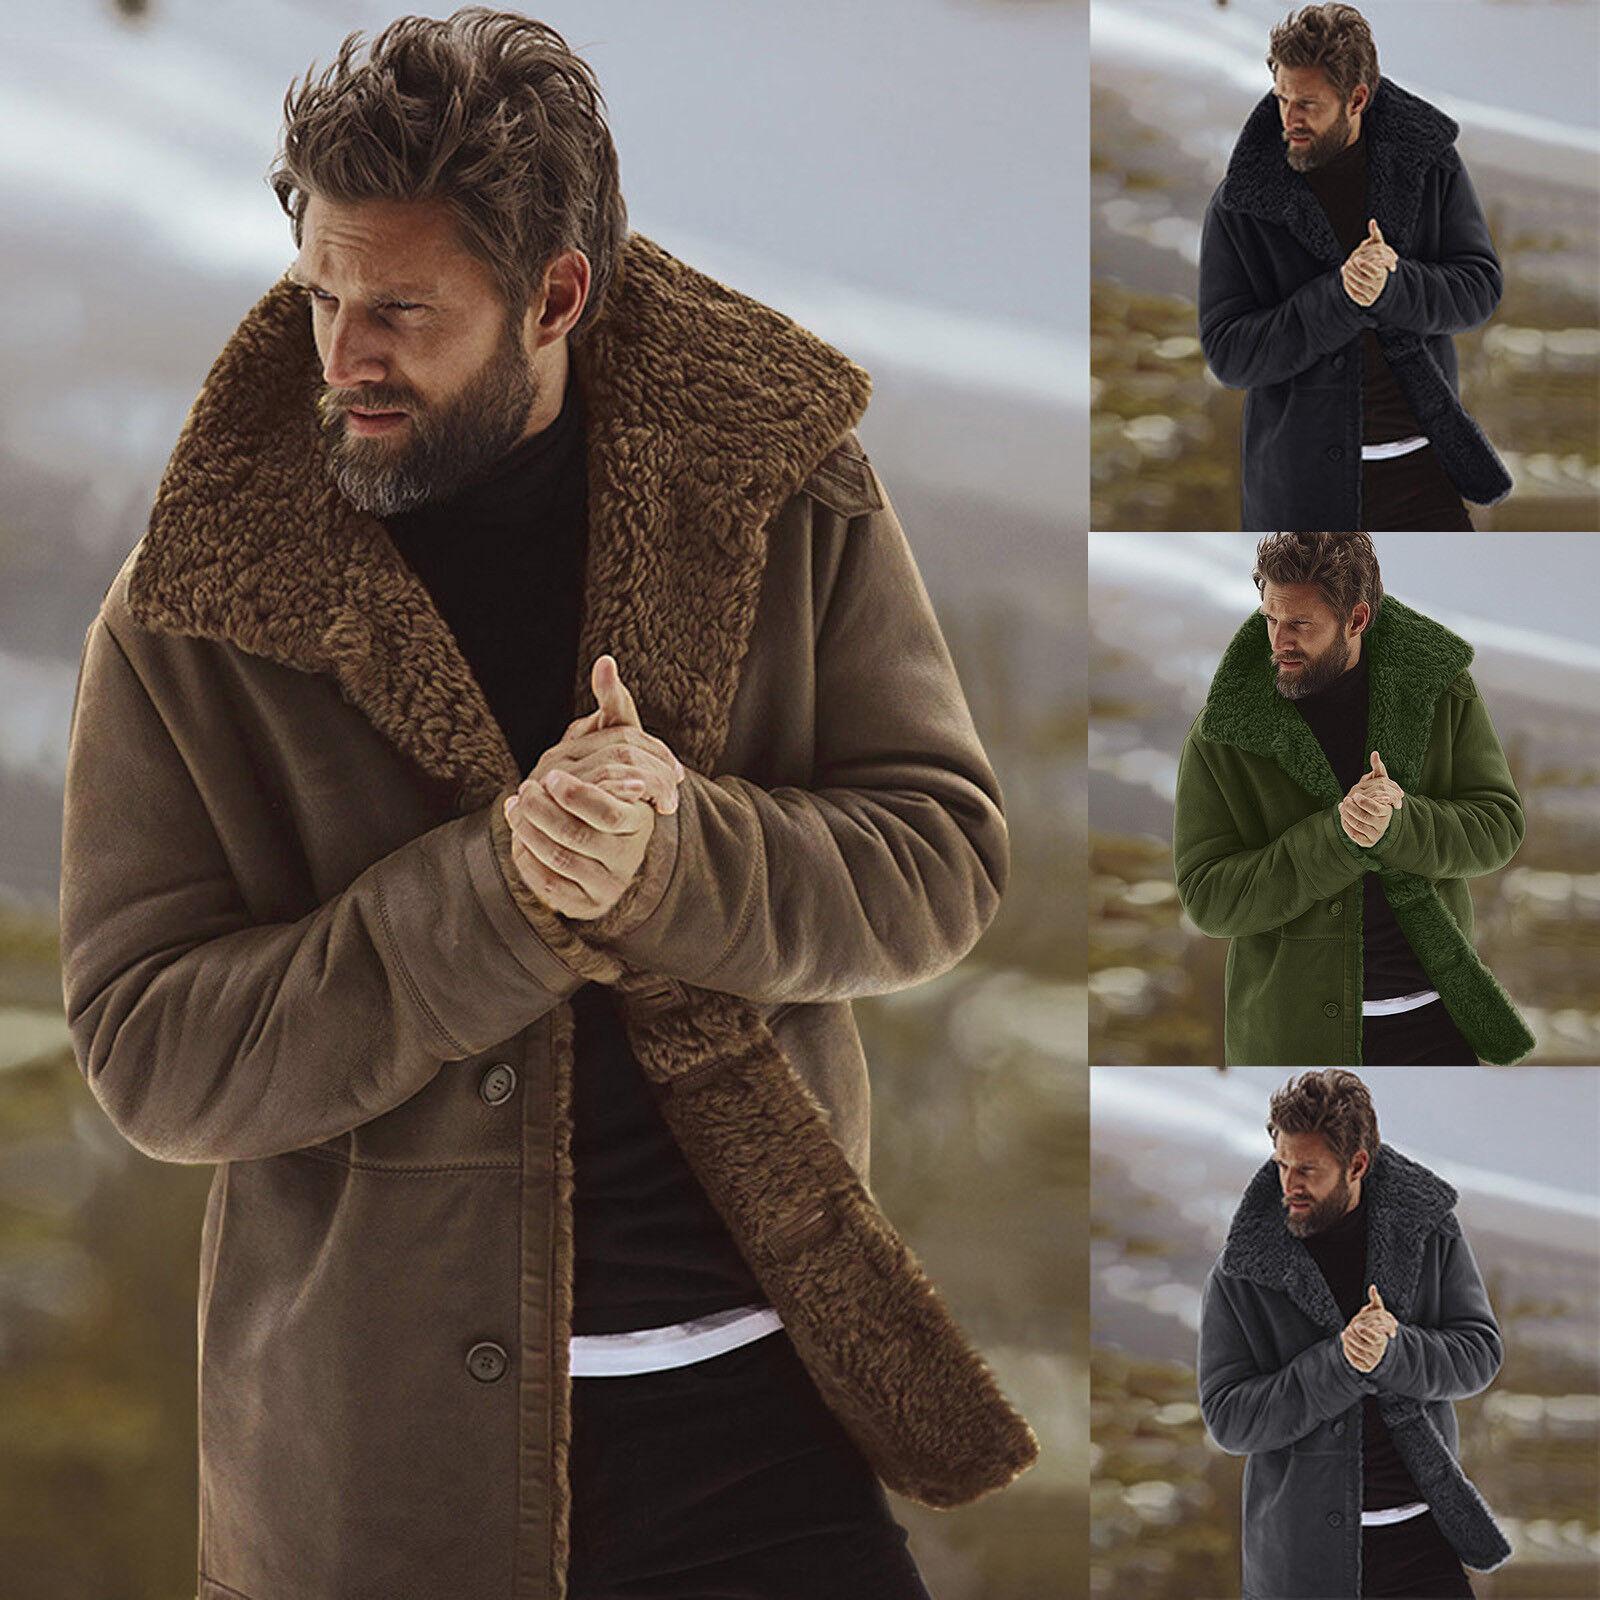 Para Hombres Lana Forrada De Piel Grueso Cuello con Solapa  Abrigo Chaqueta De Invierno Cálido Prendas de abrigo  se descuenta